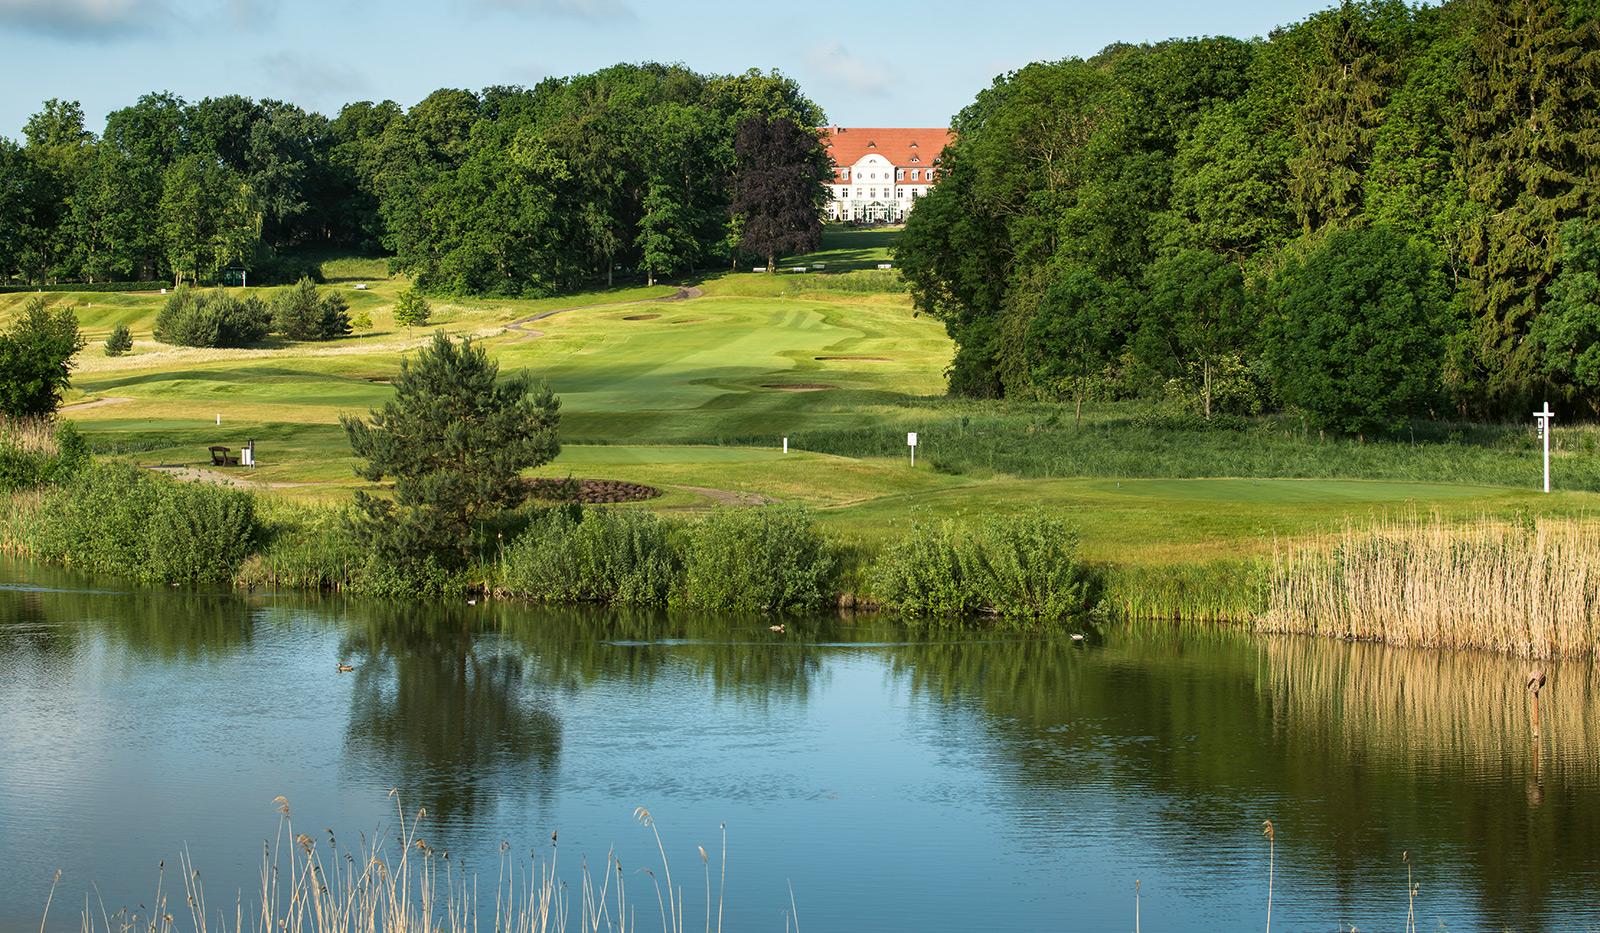 Fleesensee gewinnspiel - Golfreise Schloss Fleesensee – Gewinnspiel